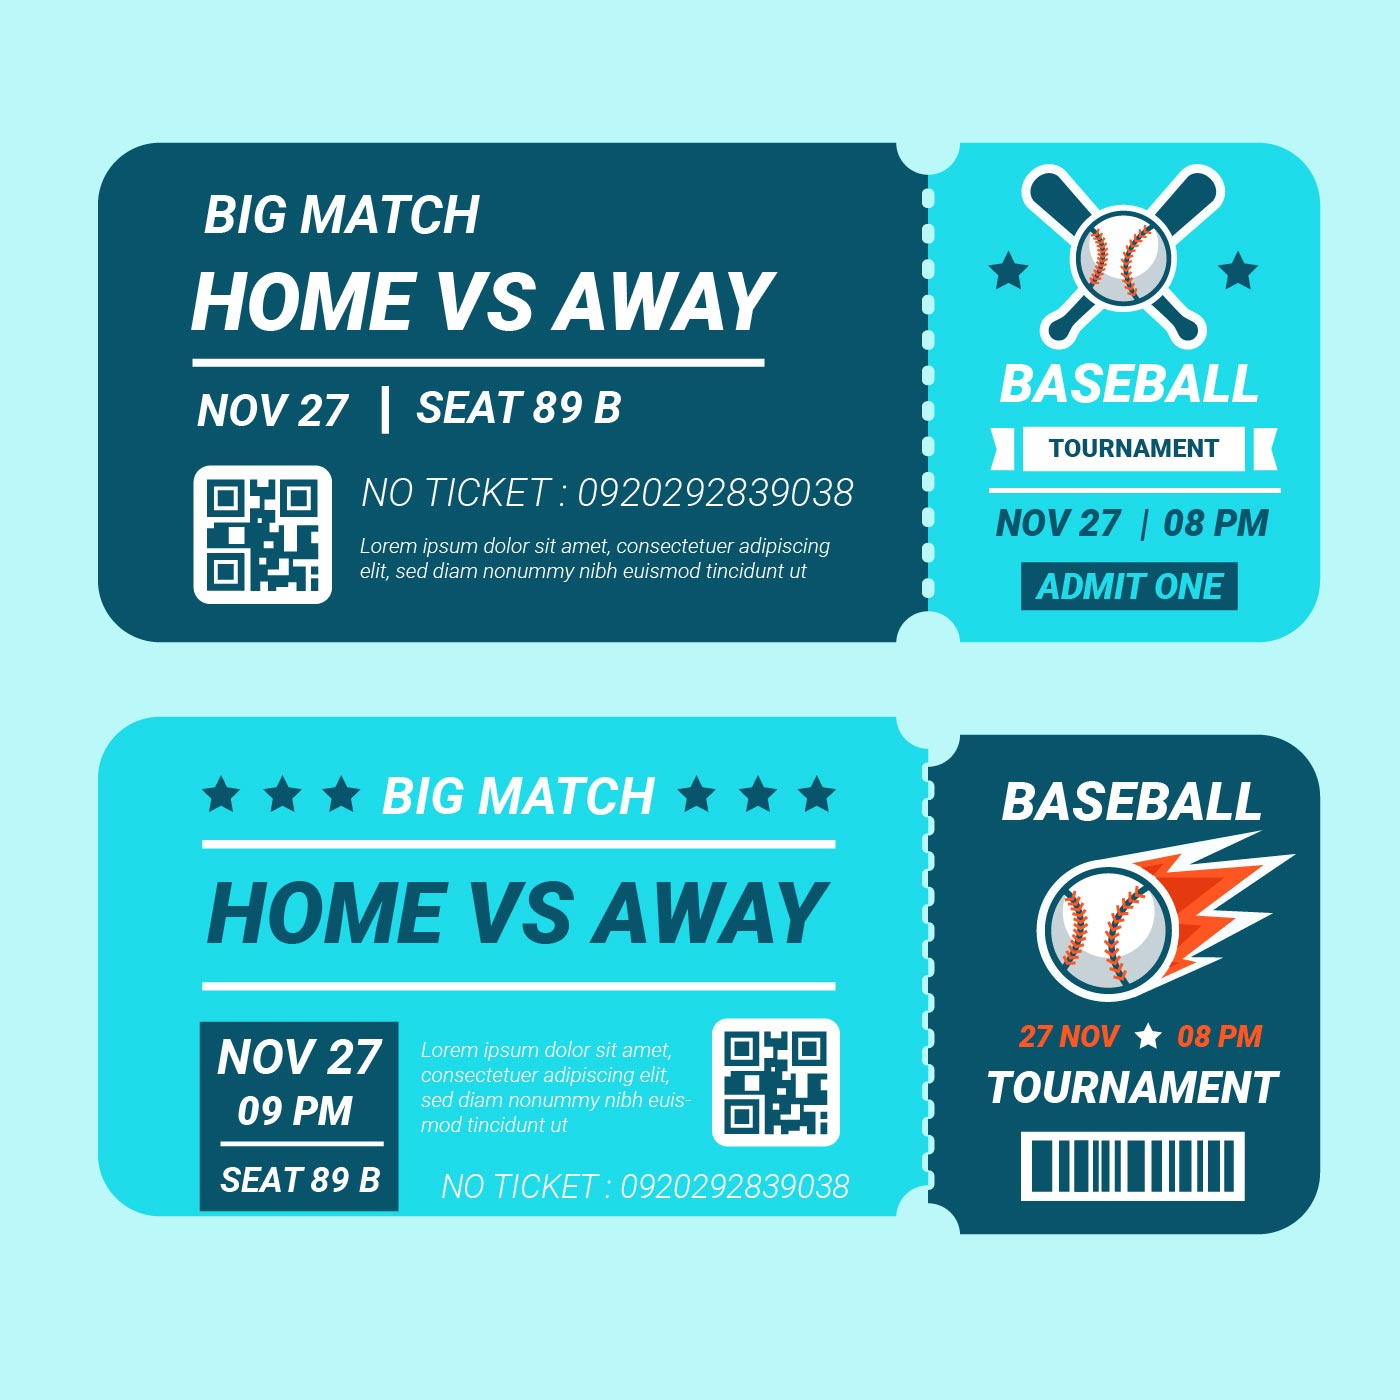 baseball tournament ticket vector